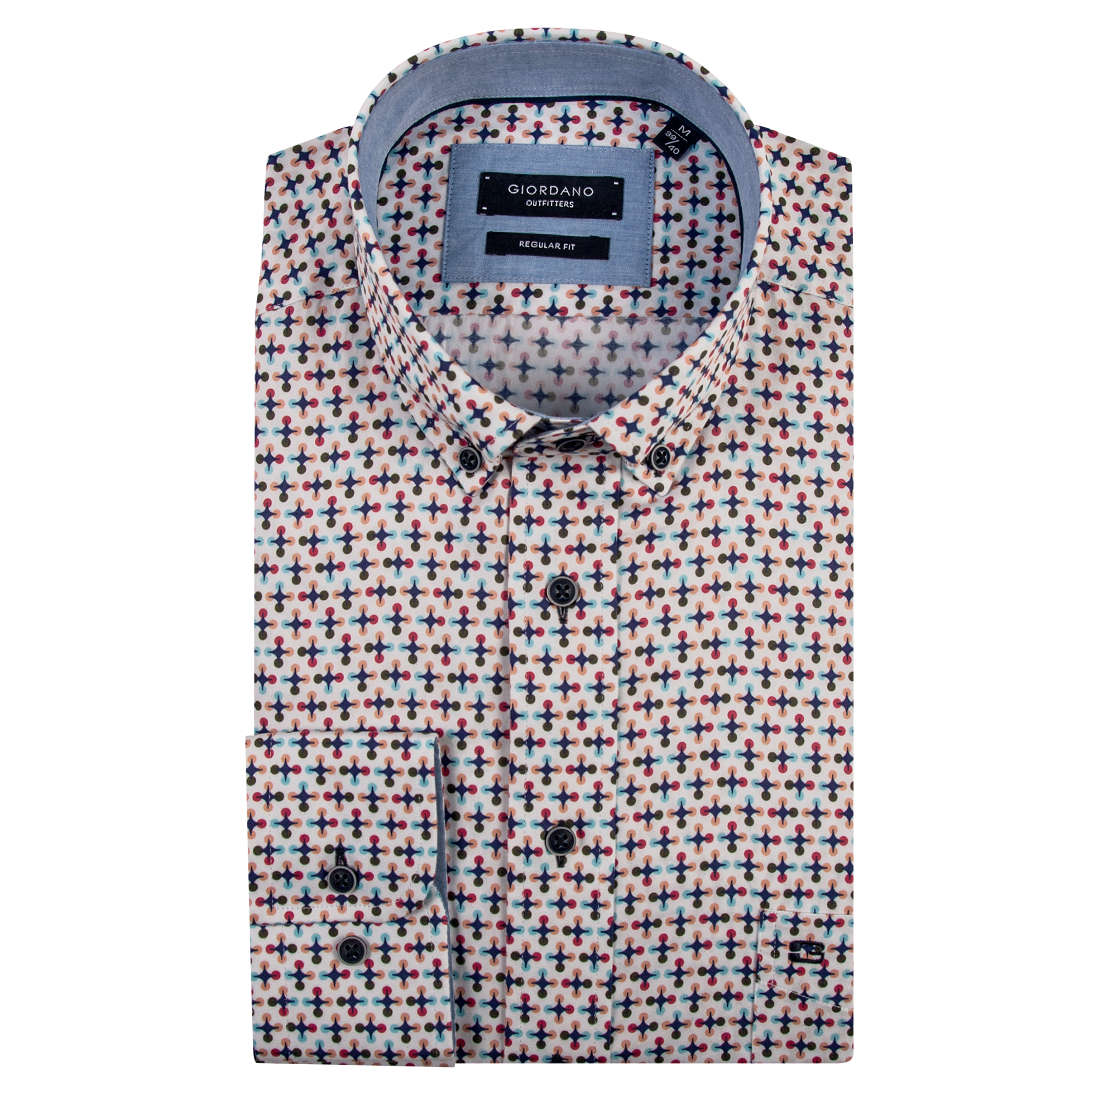 Giordano overhemd Regular Fit 91-6025 in het Aqua